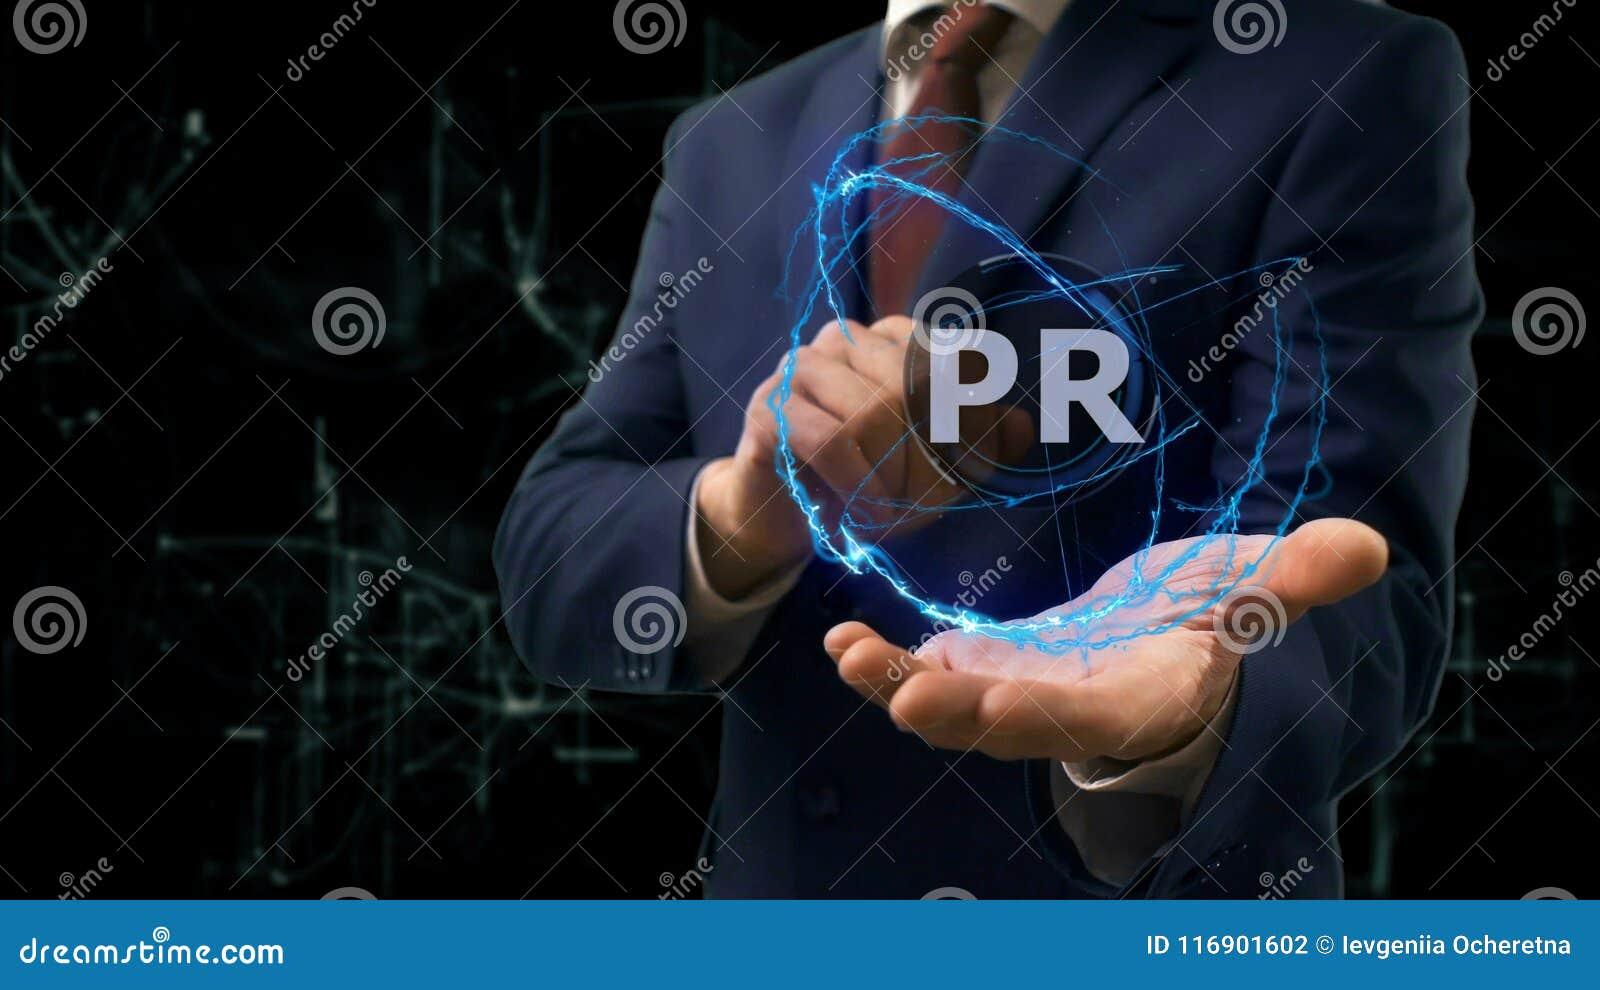 Businessman shows concept hologram PR on his hand